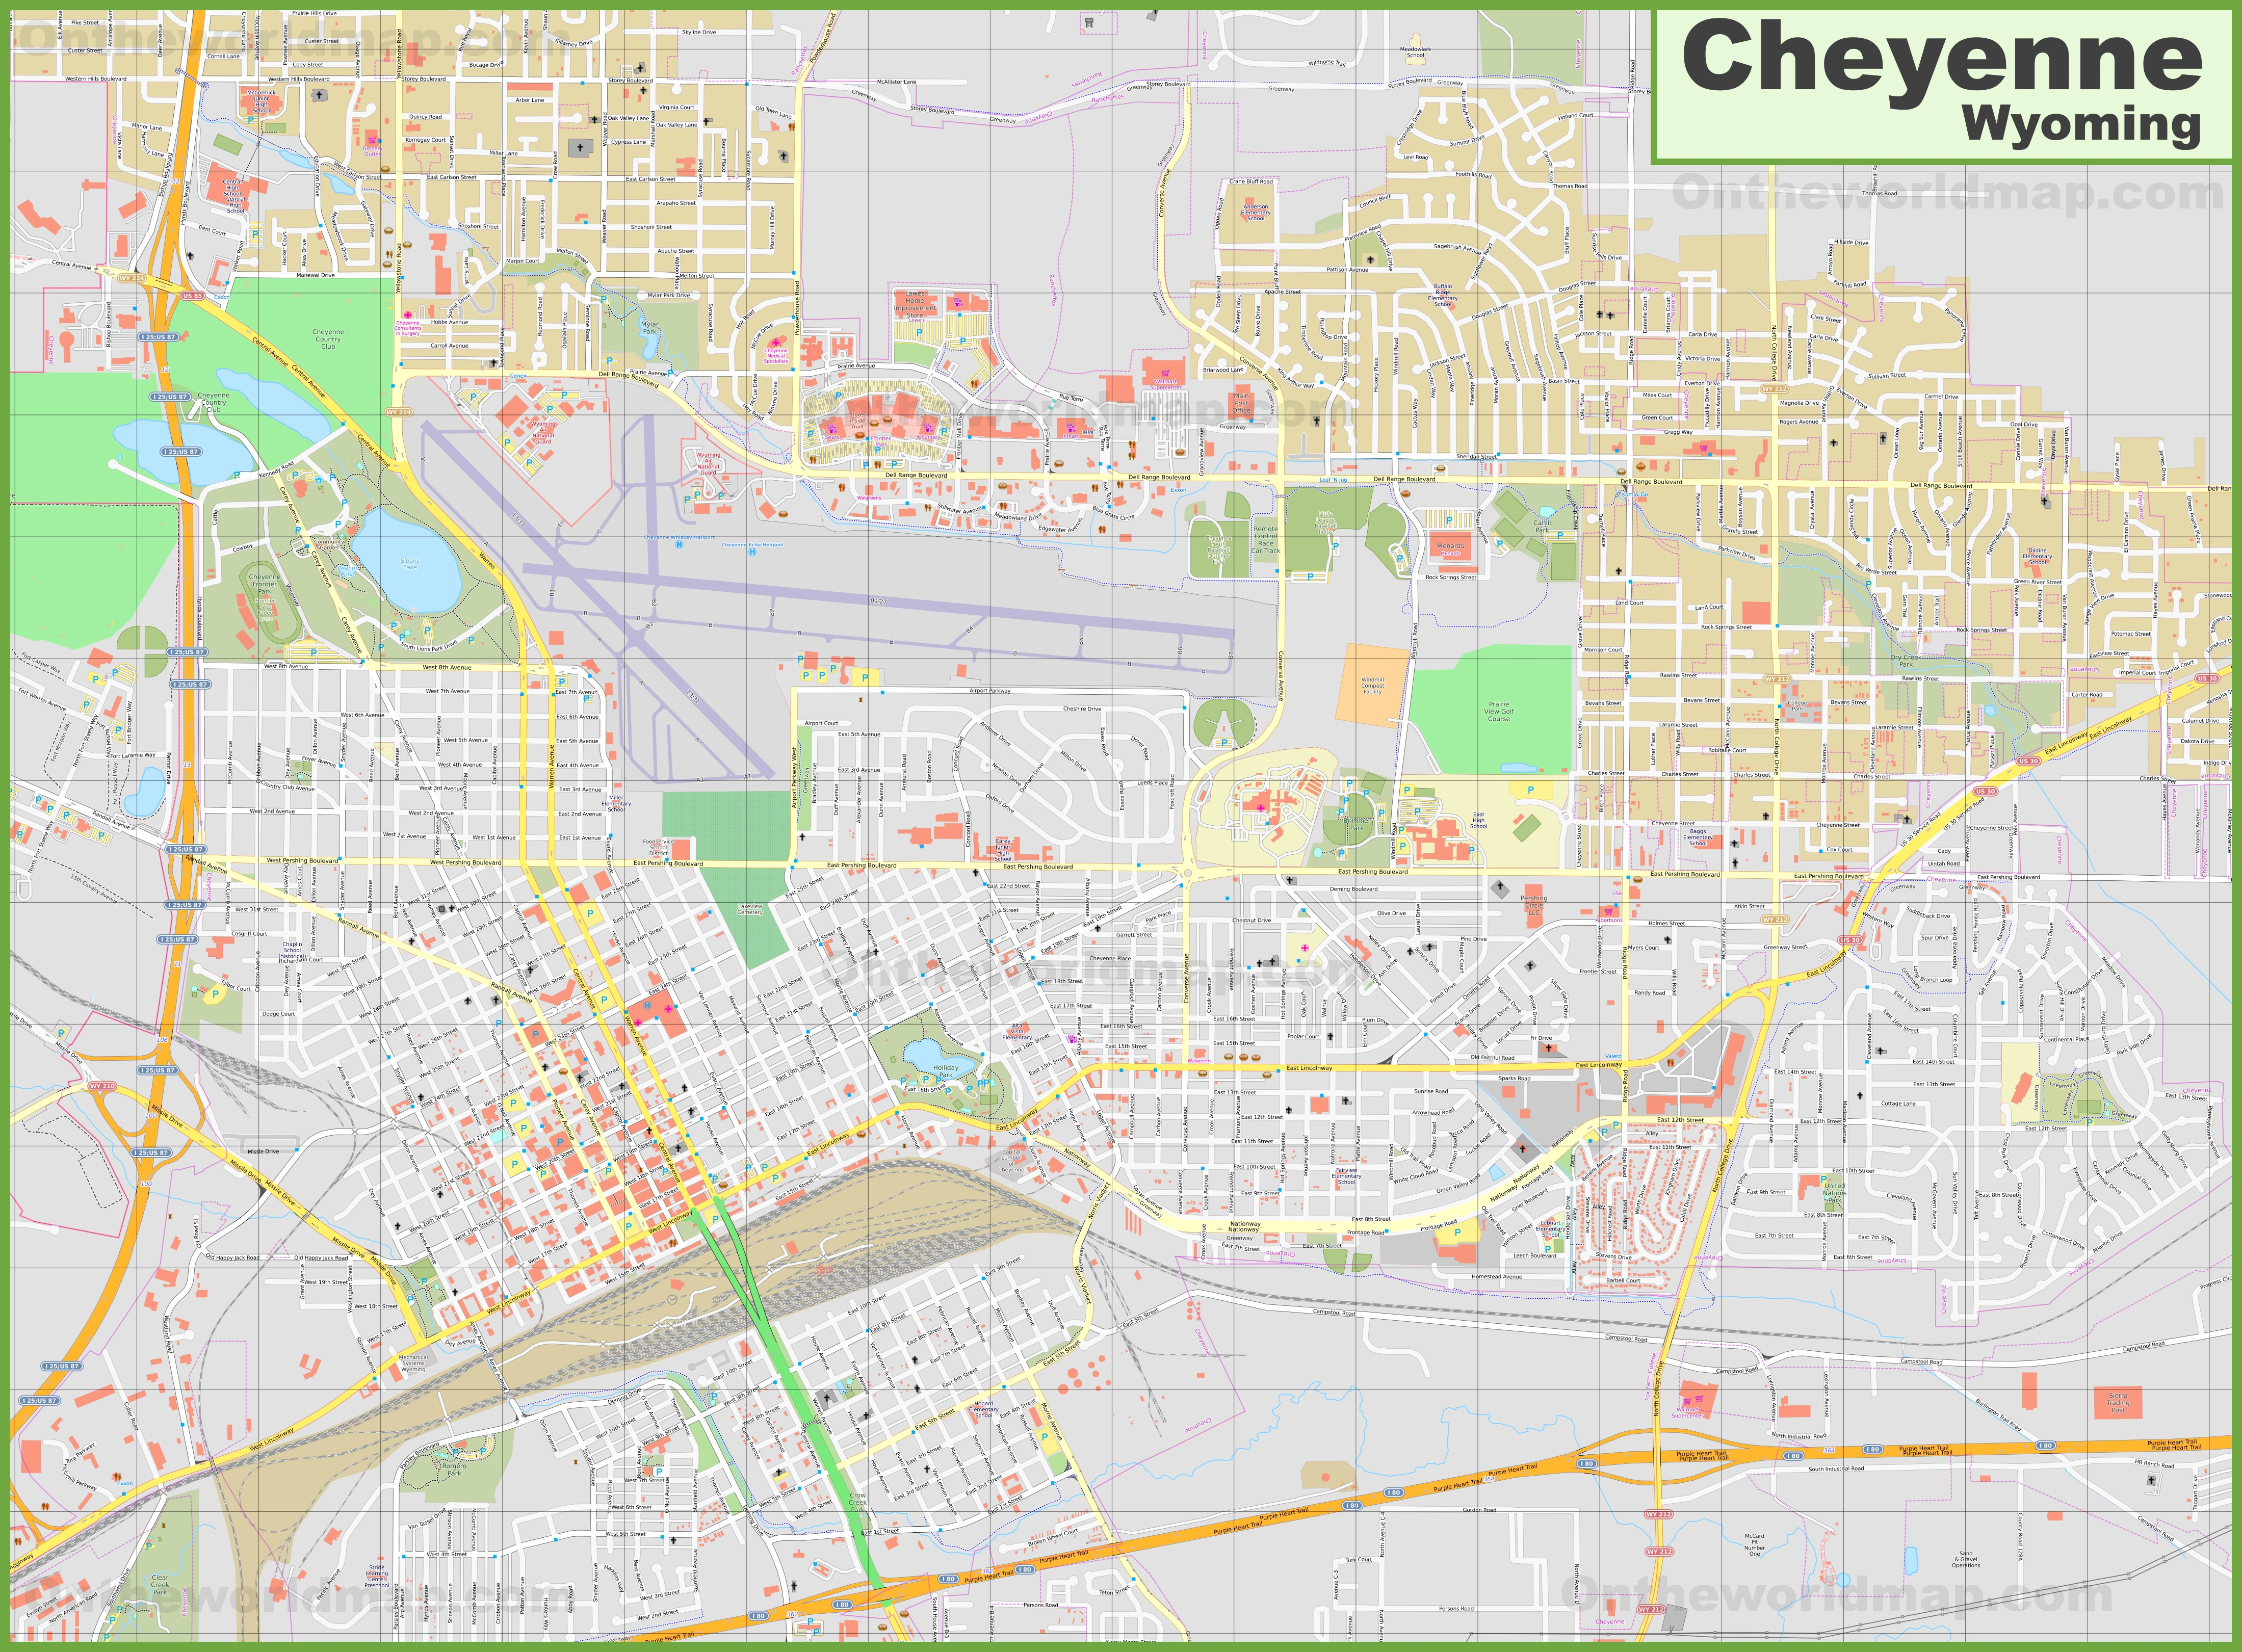 Cheyenne Maps Wyoming US Maps of Cheyenne